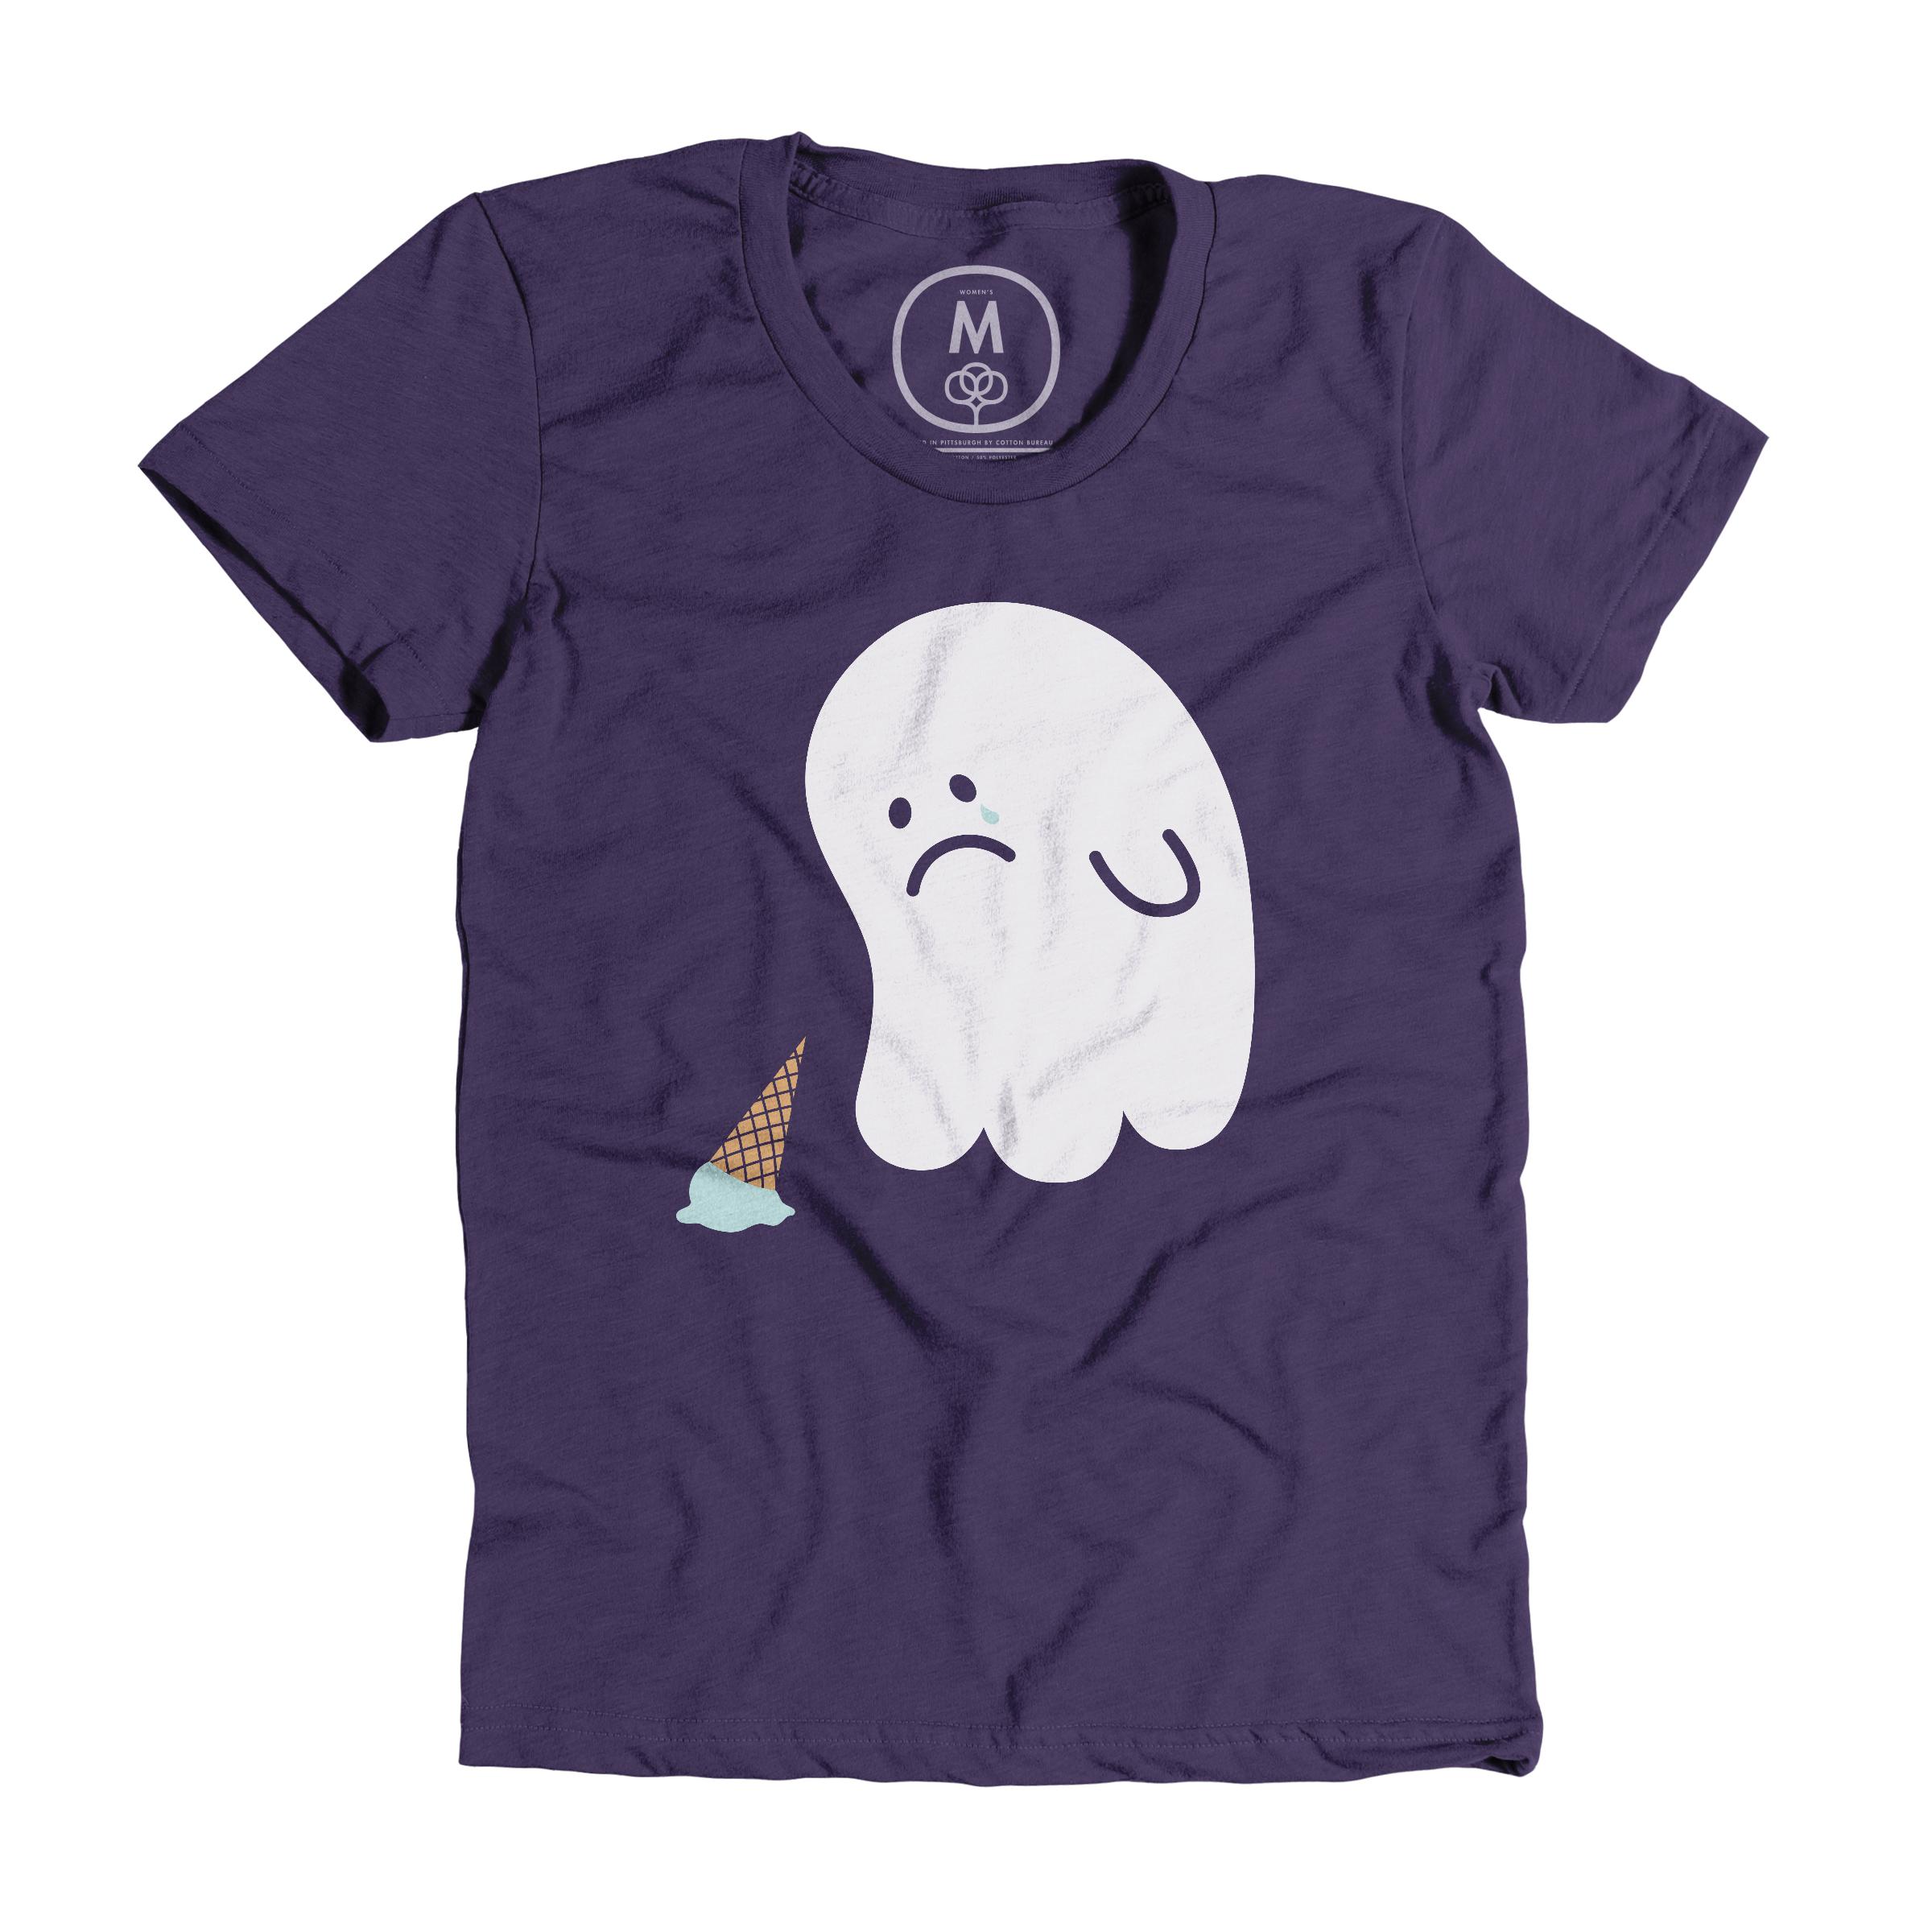 Sad Ghost Storm (Women's)